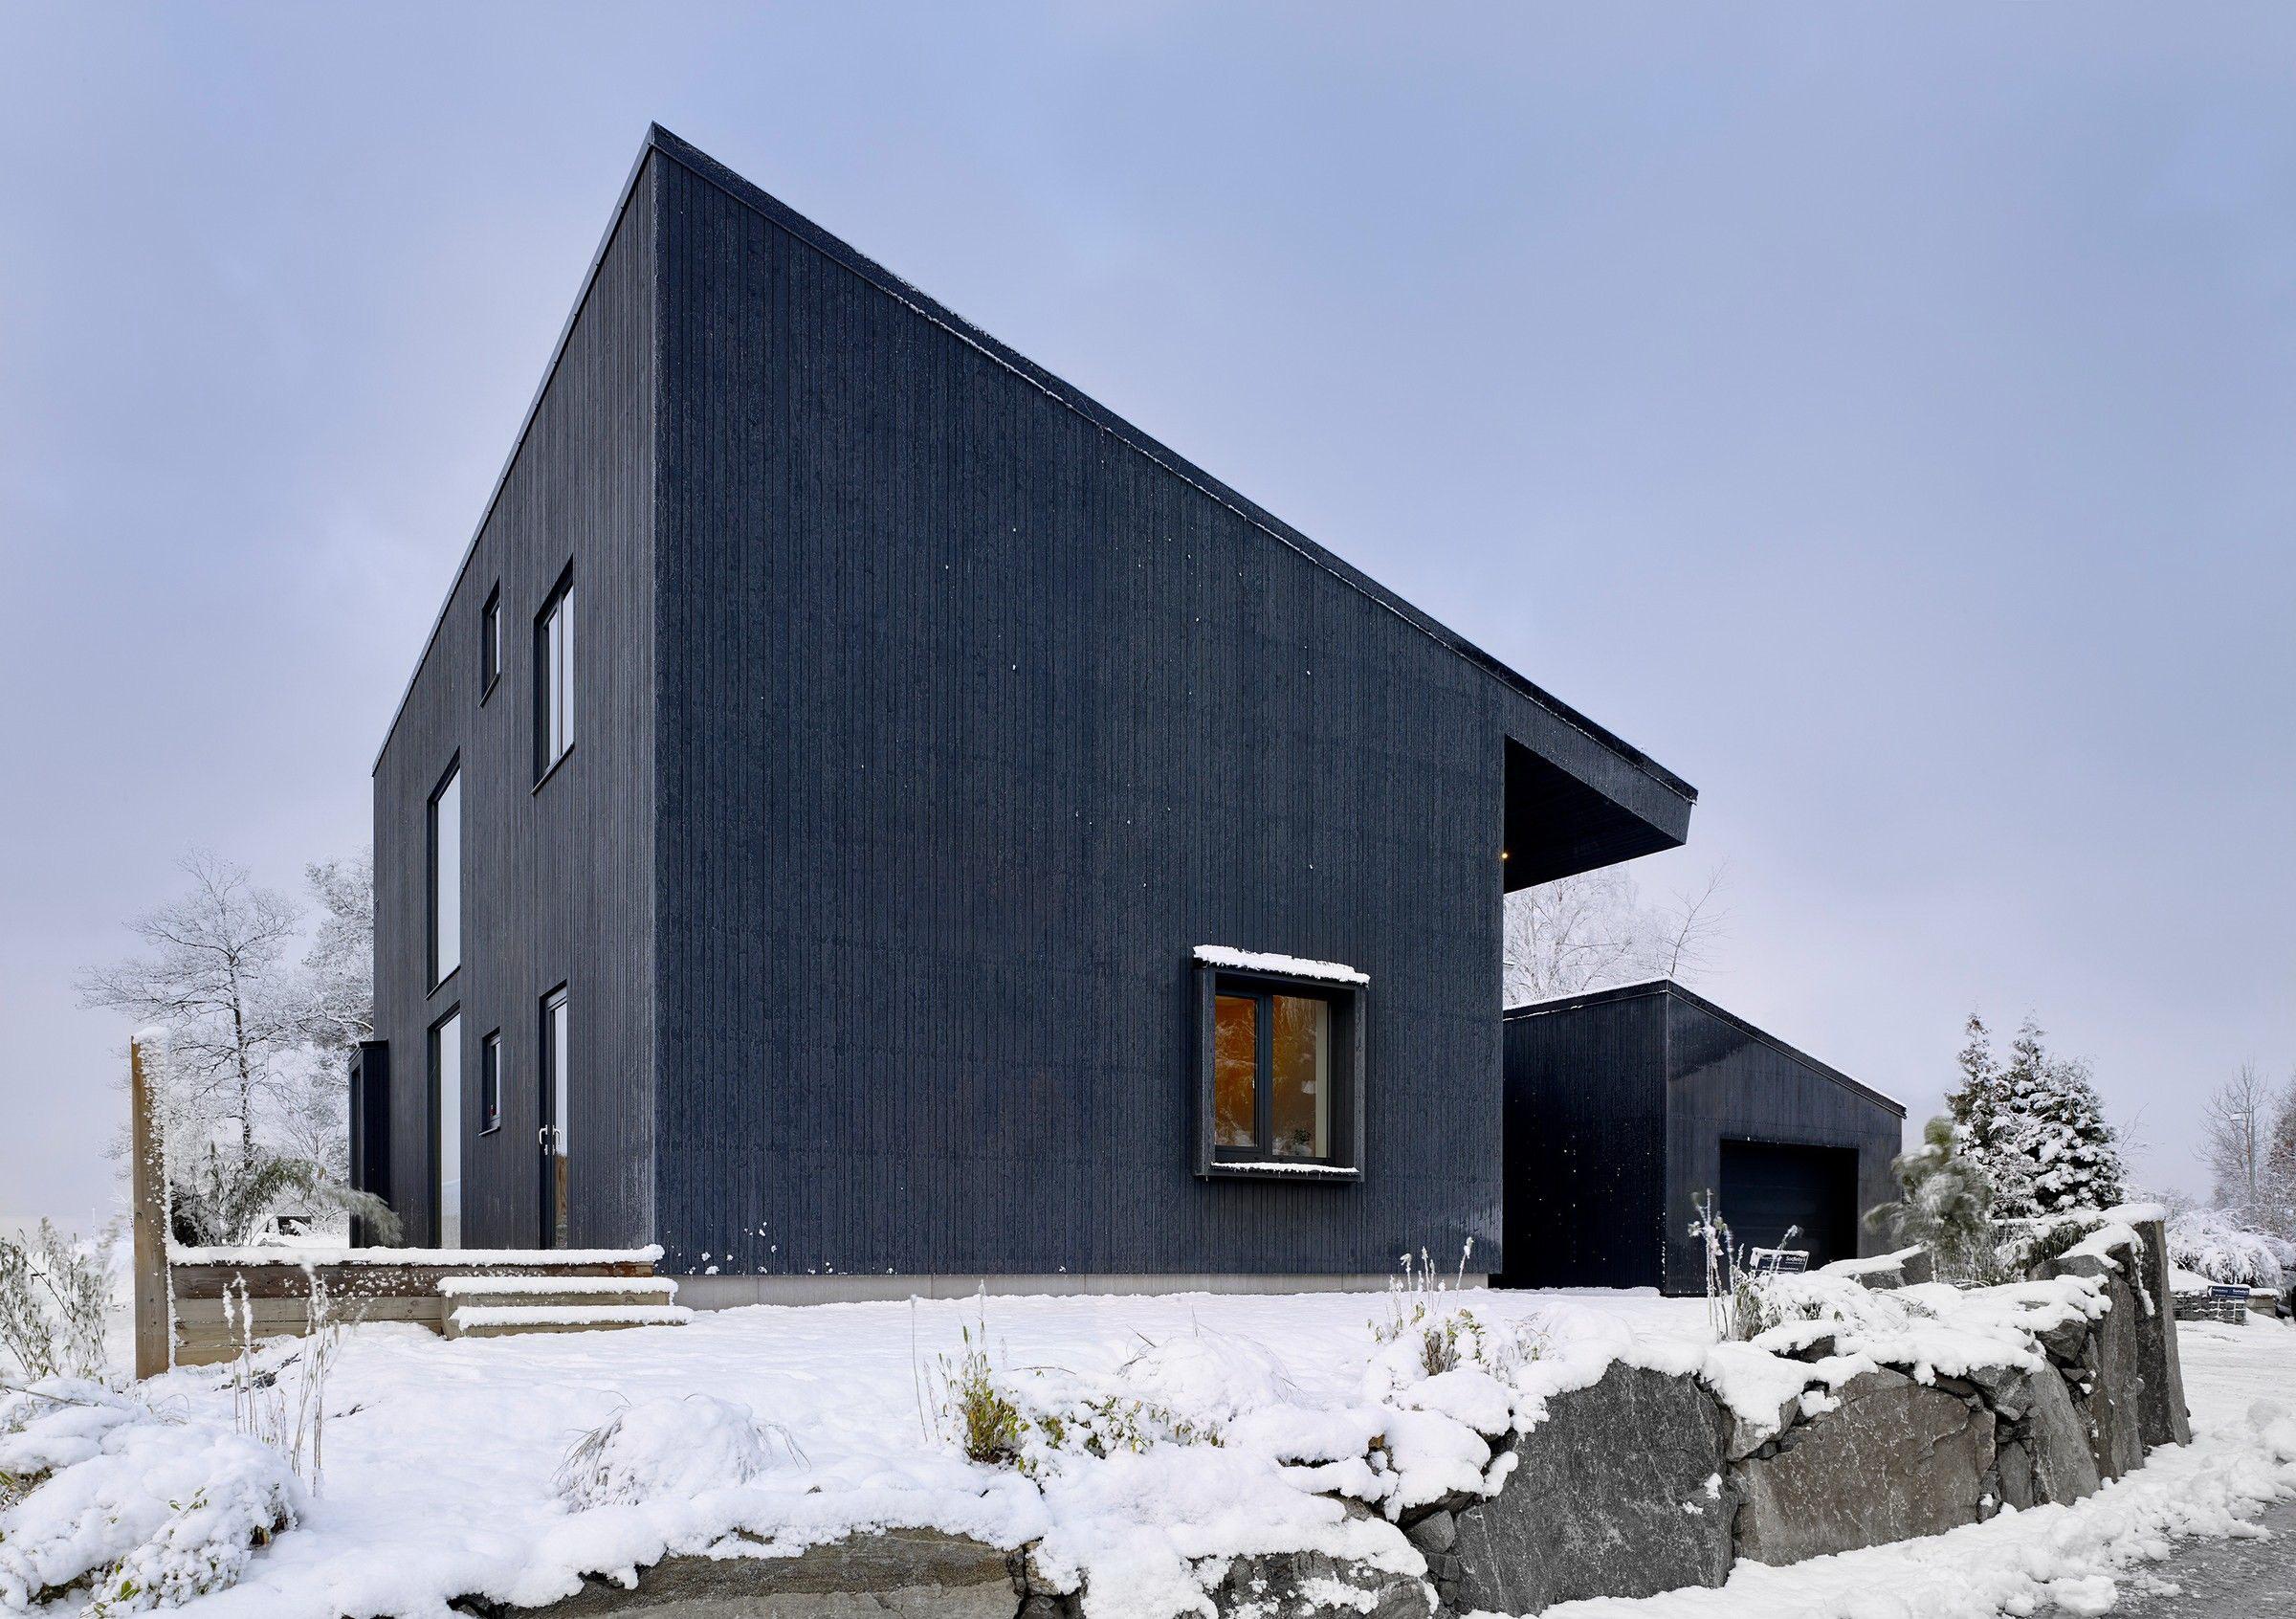 Öjersjö-House by Bornstein Lyckefors Architects